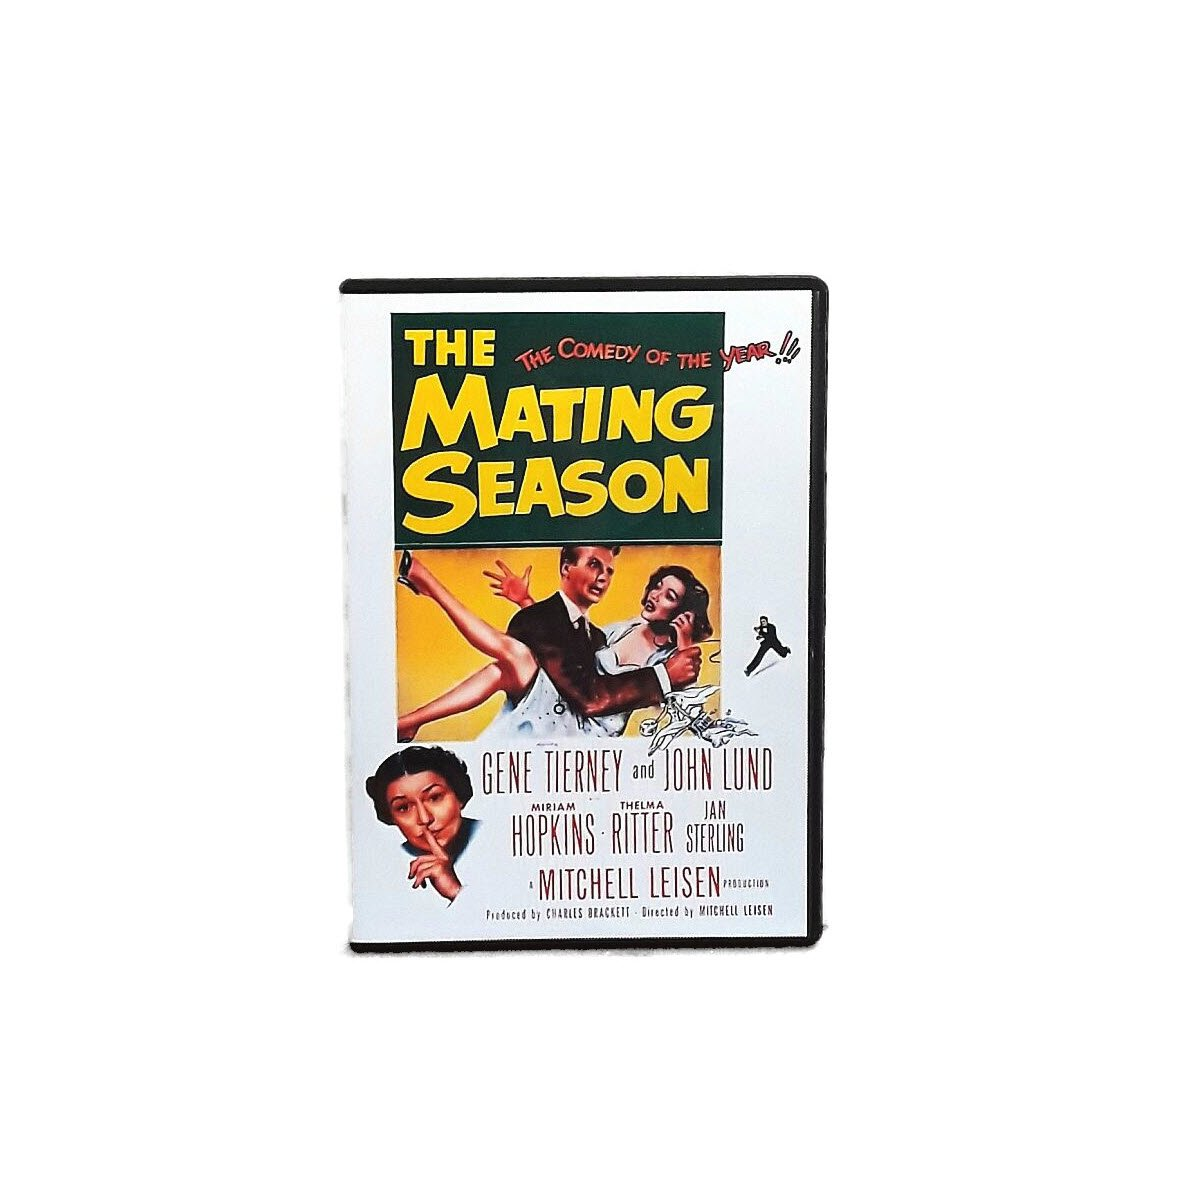 The Mating Season 1951 Gene Tierney Comedy Drama